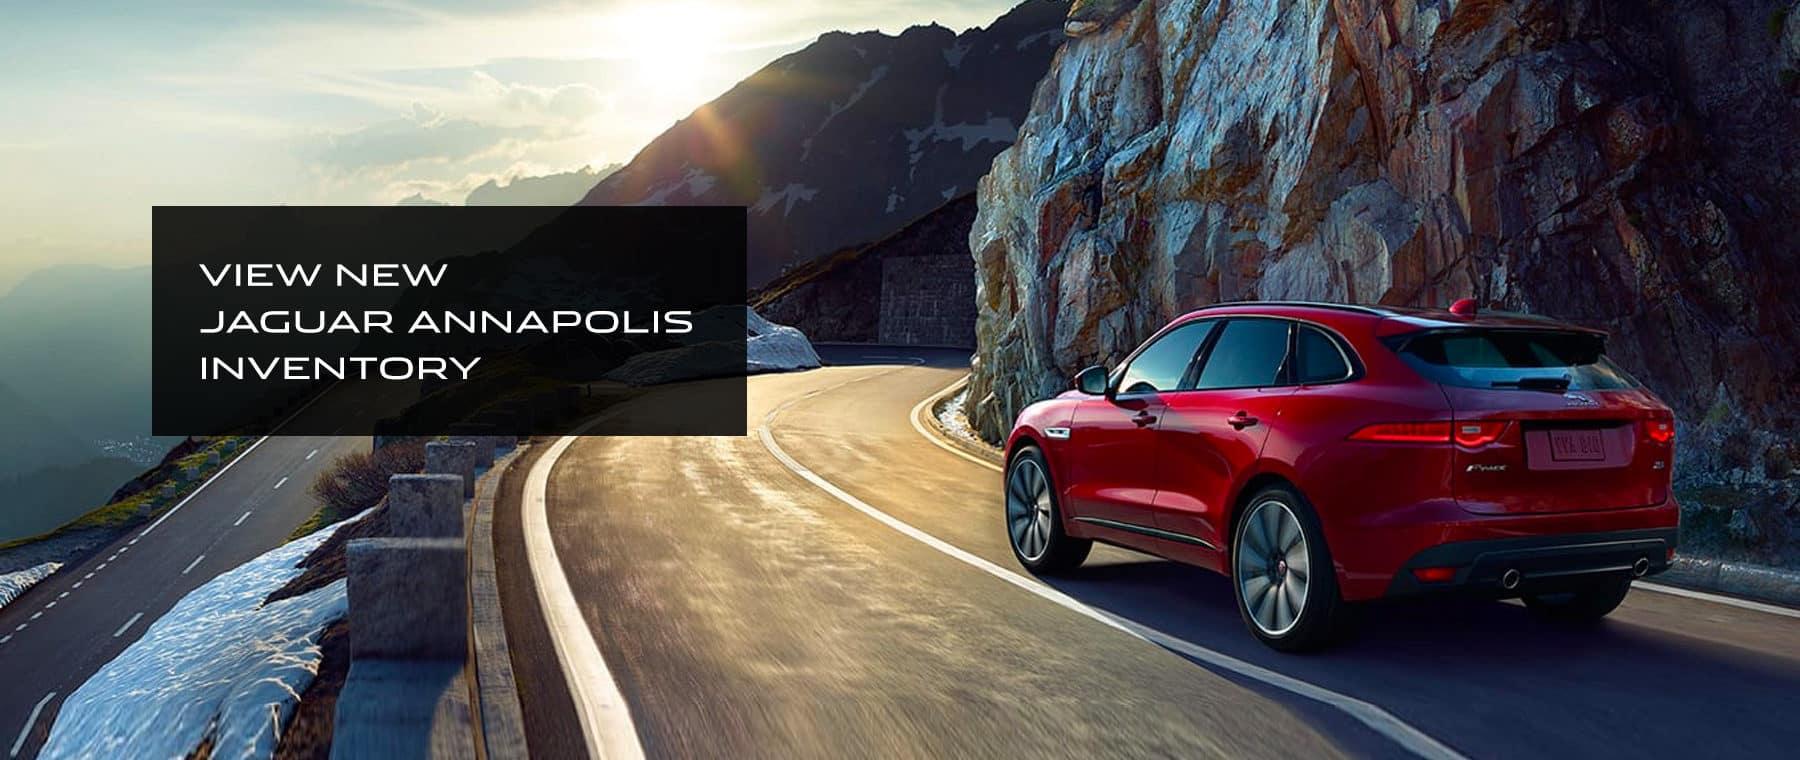 Wonderful New Jaguar Inventory Banner